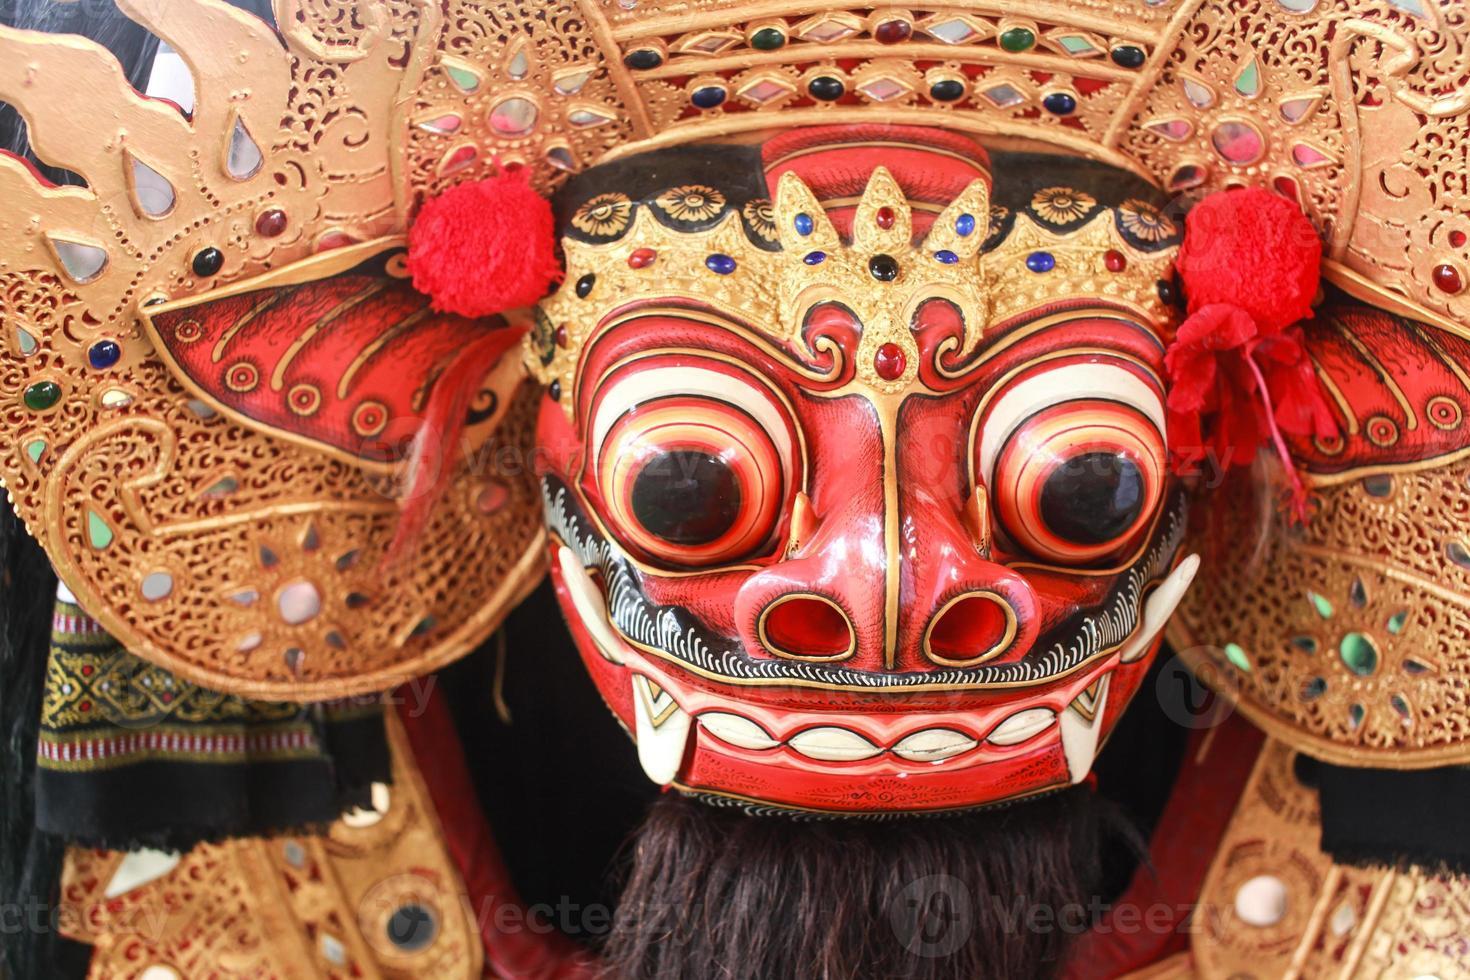 máscara de barong, assinatura da cultura balinesa foto